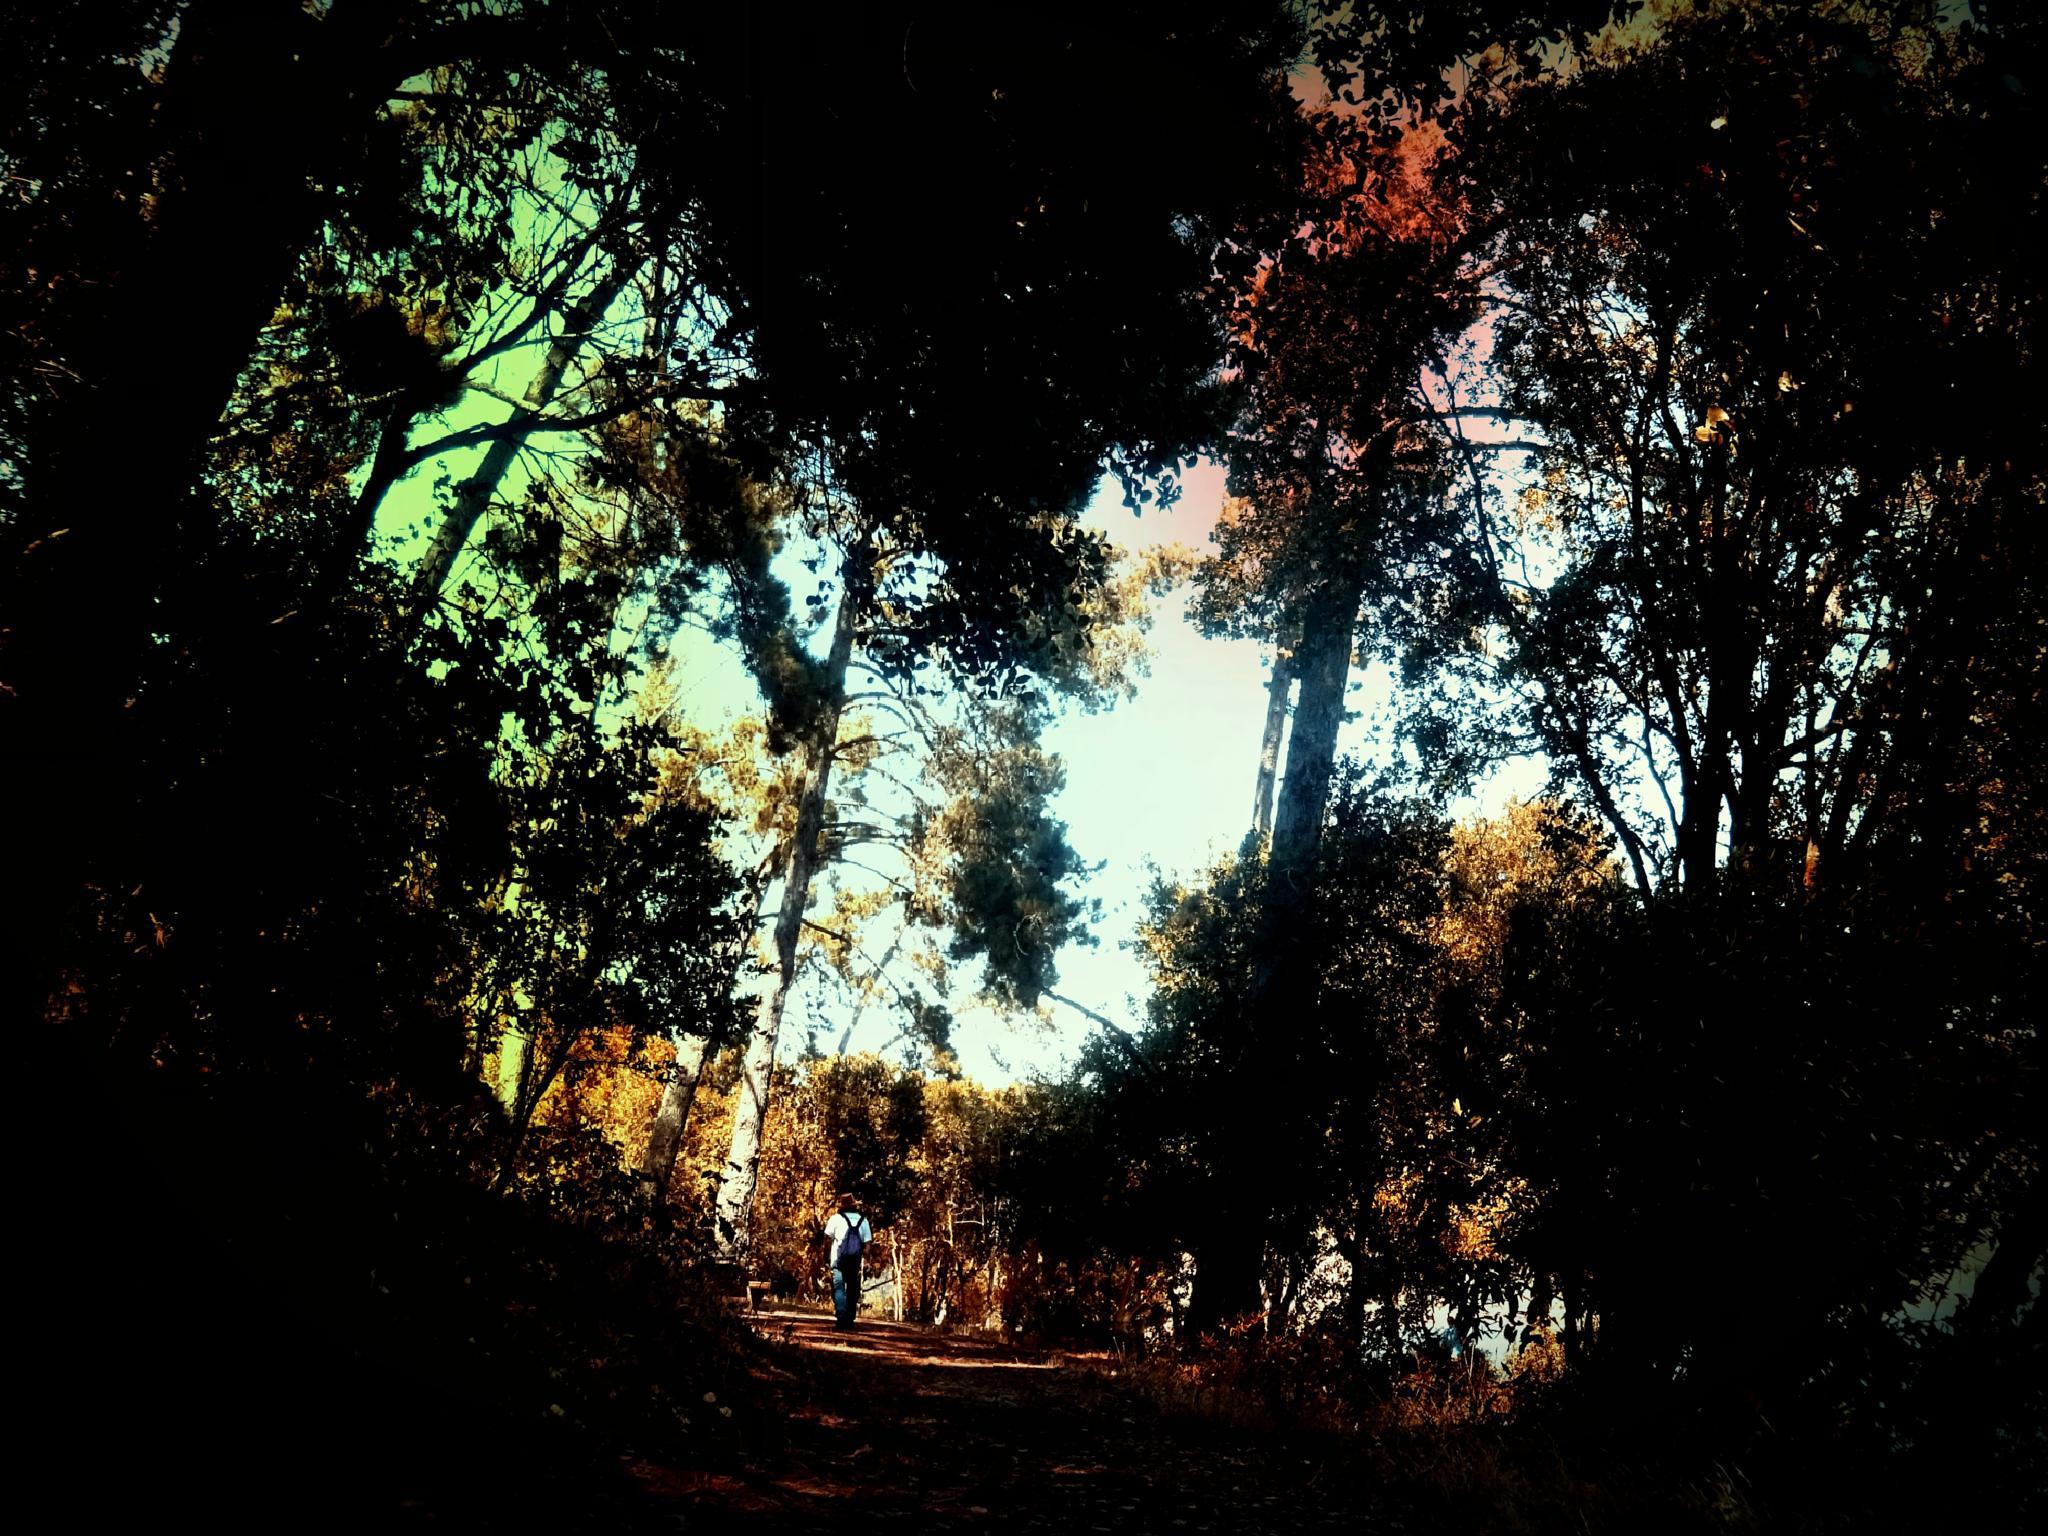 In the woods by gudrun.jones